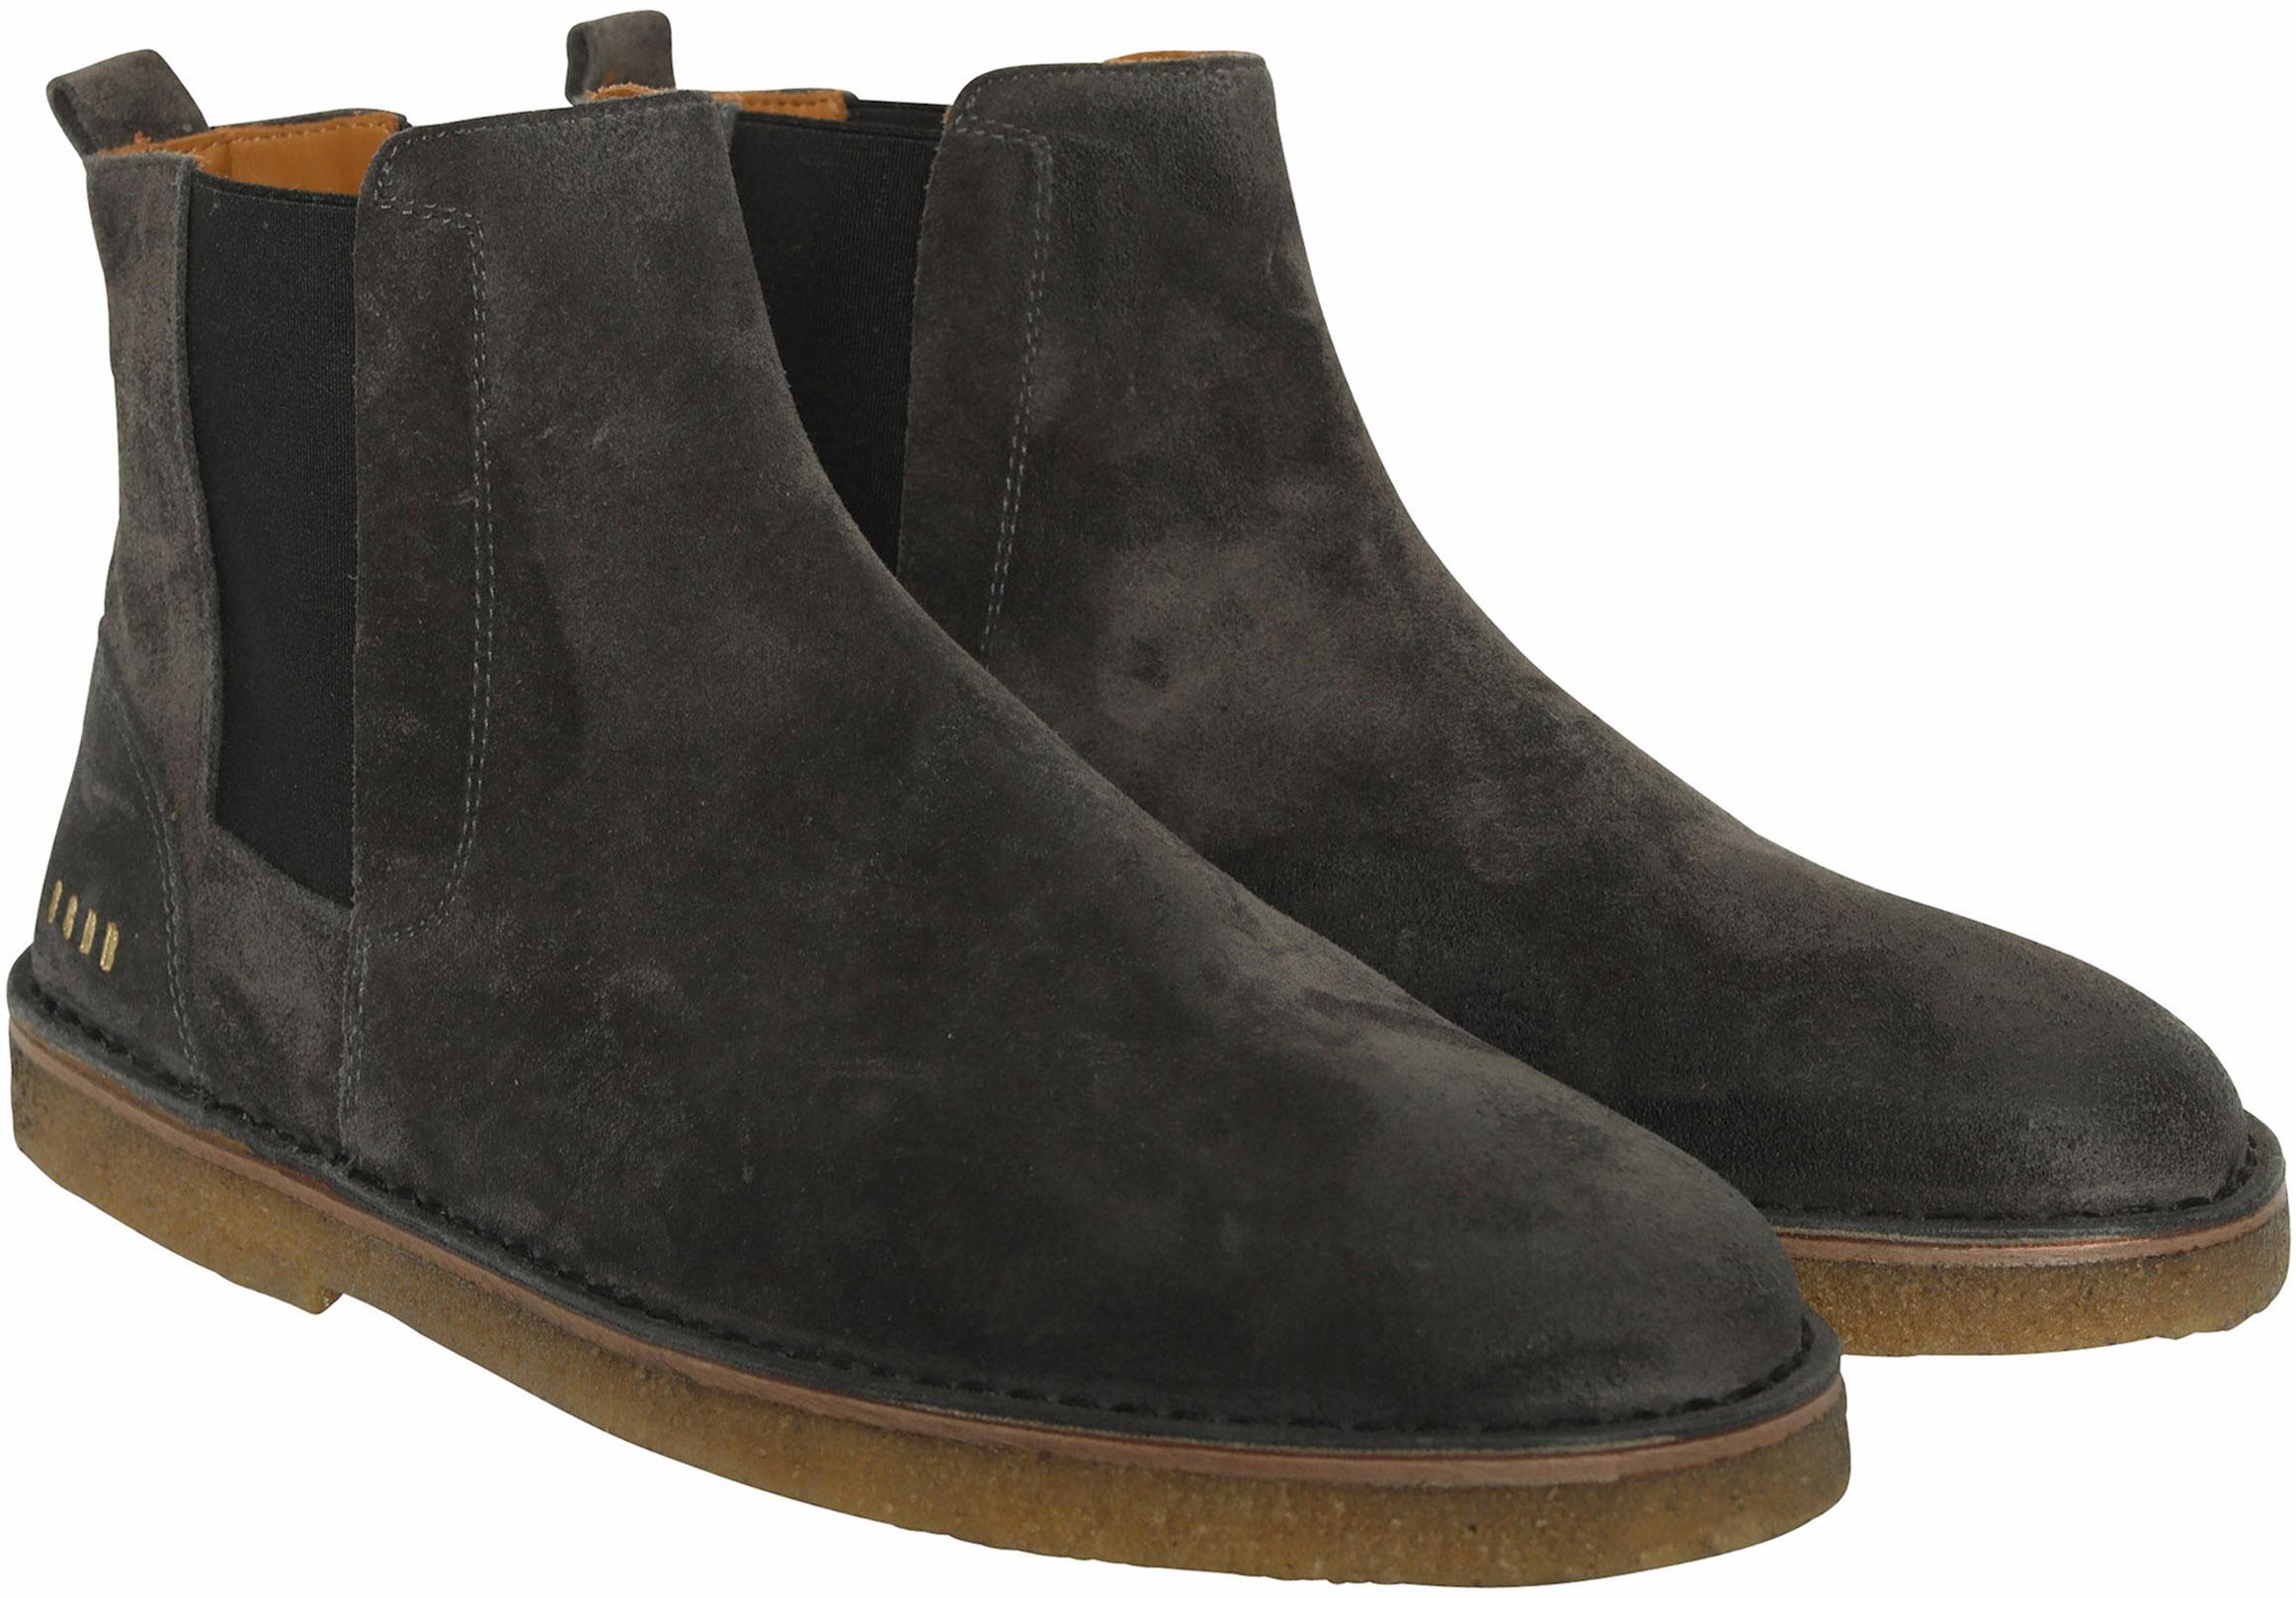 94f7d082d9dfcb ... Vorschau: Men's Golden Goose Boots Portman Darkgrey ...